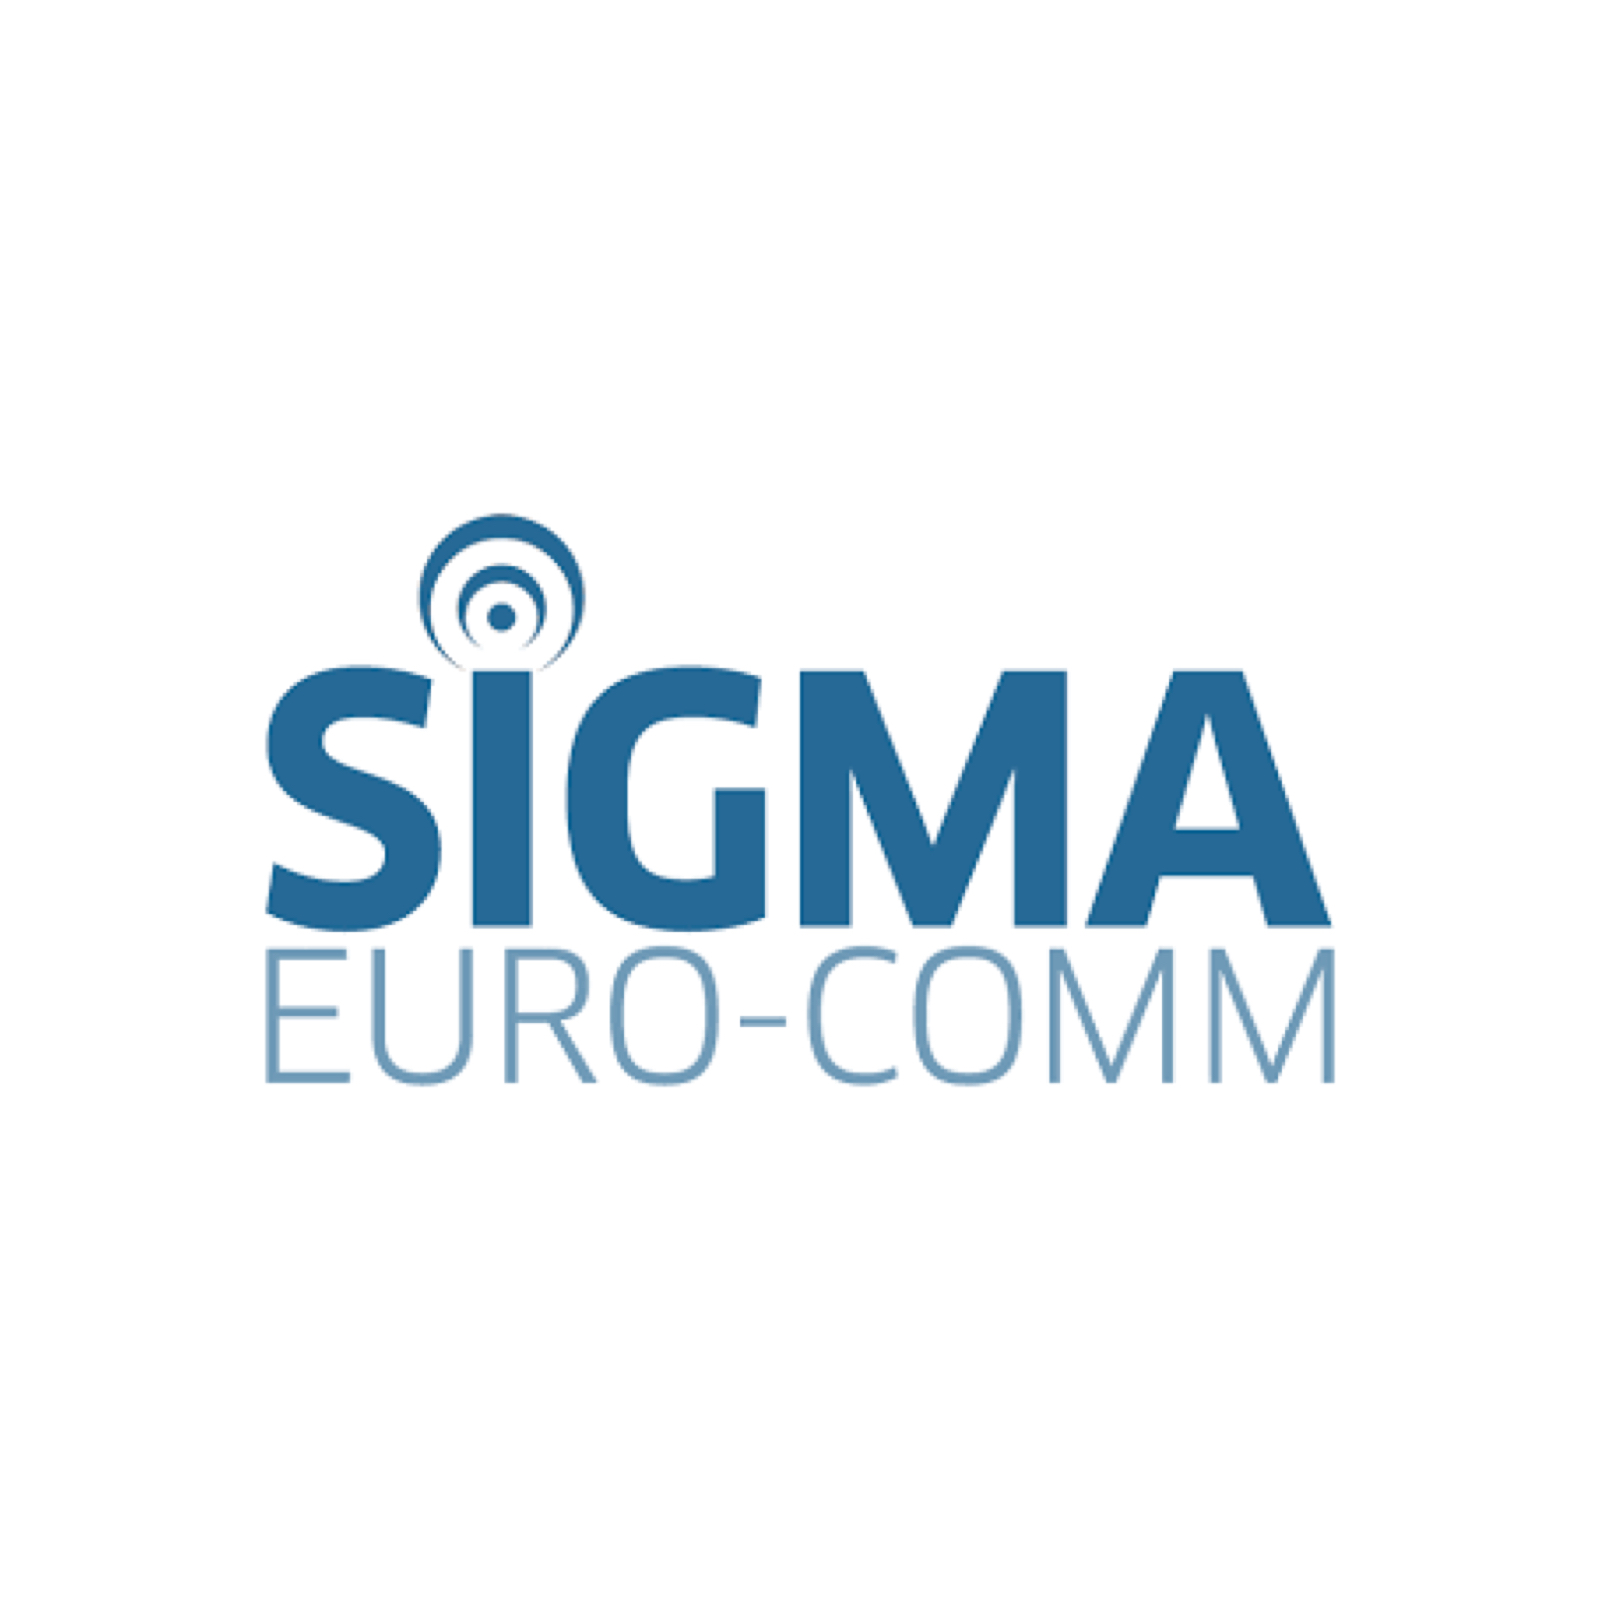 Sigma Euro-Comm